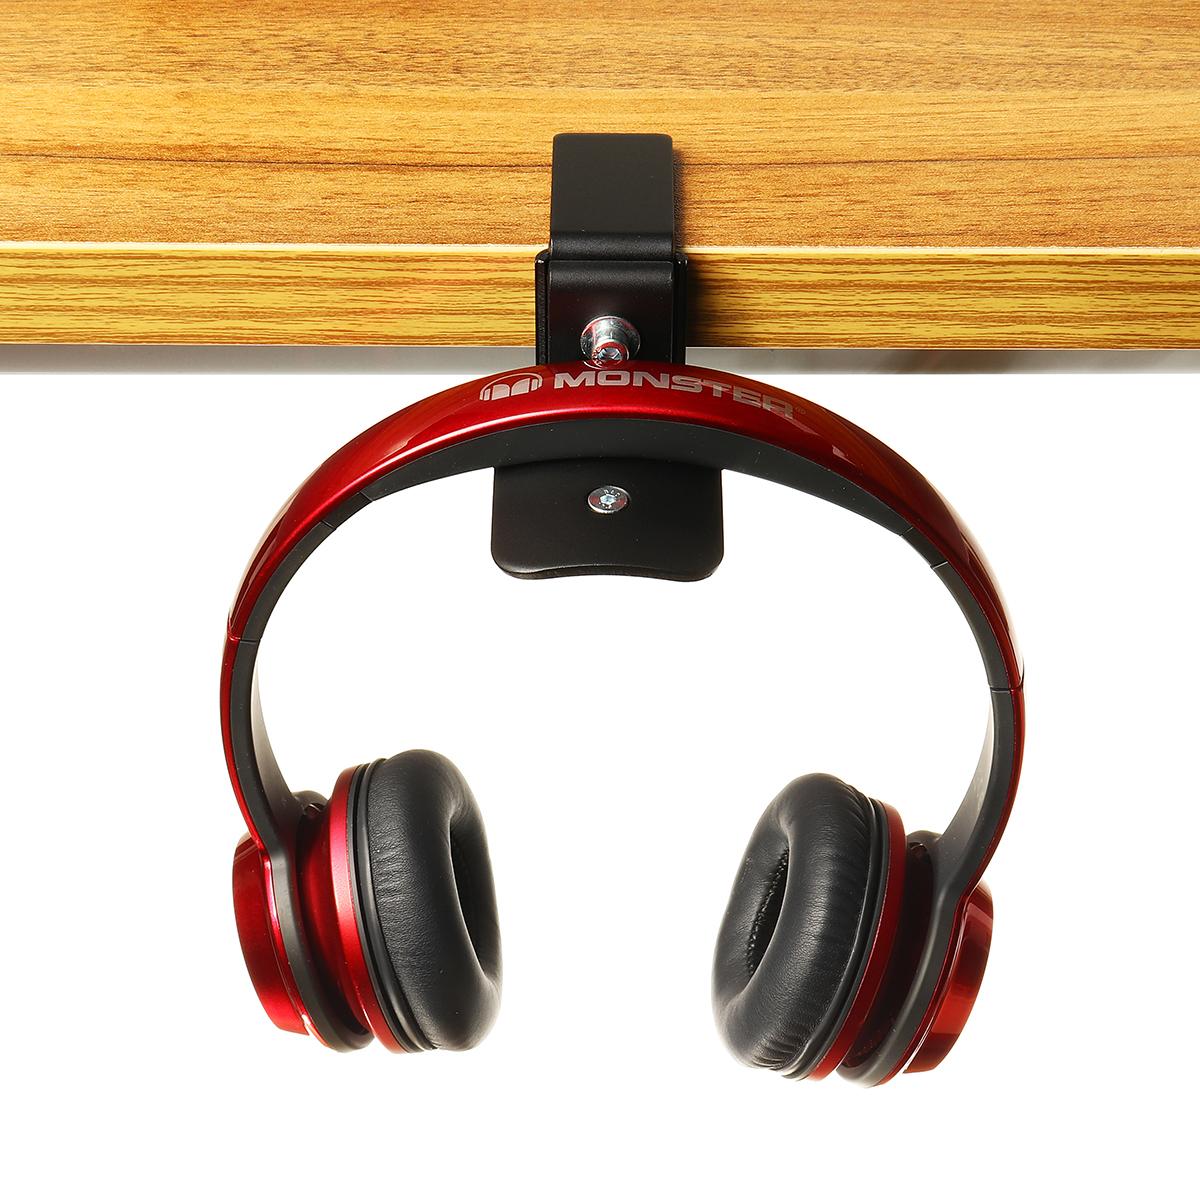 Universal Metal Headset Earphone Headphone Hanger Stand Holder Desktop Table Clamp Clip Hook